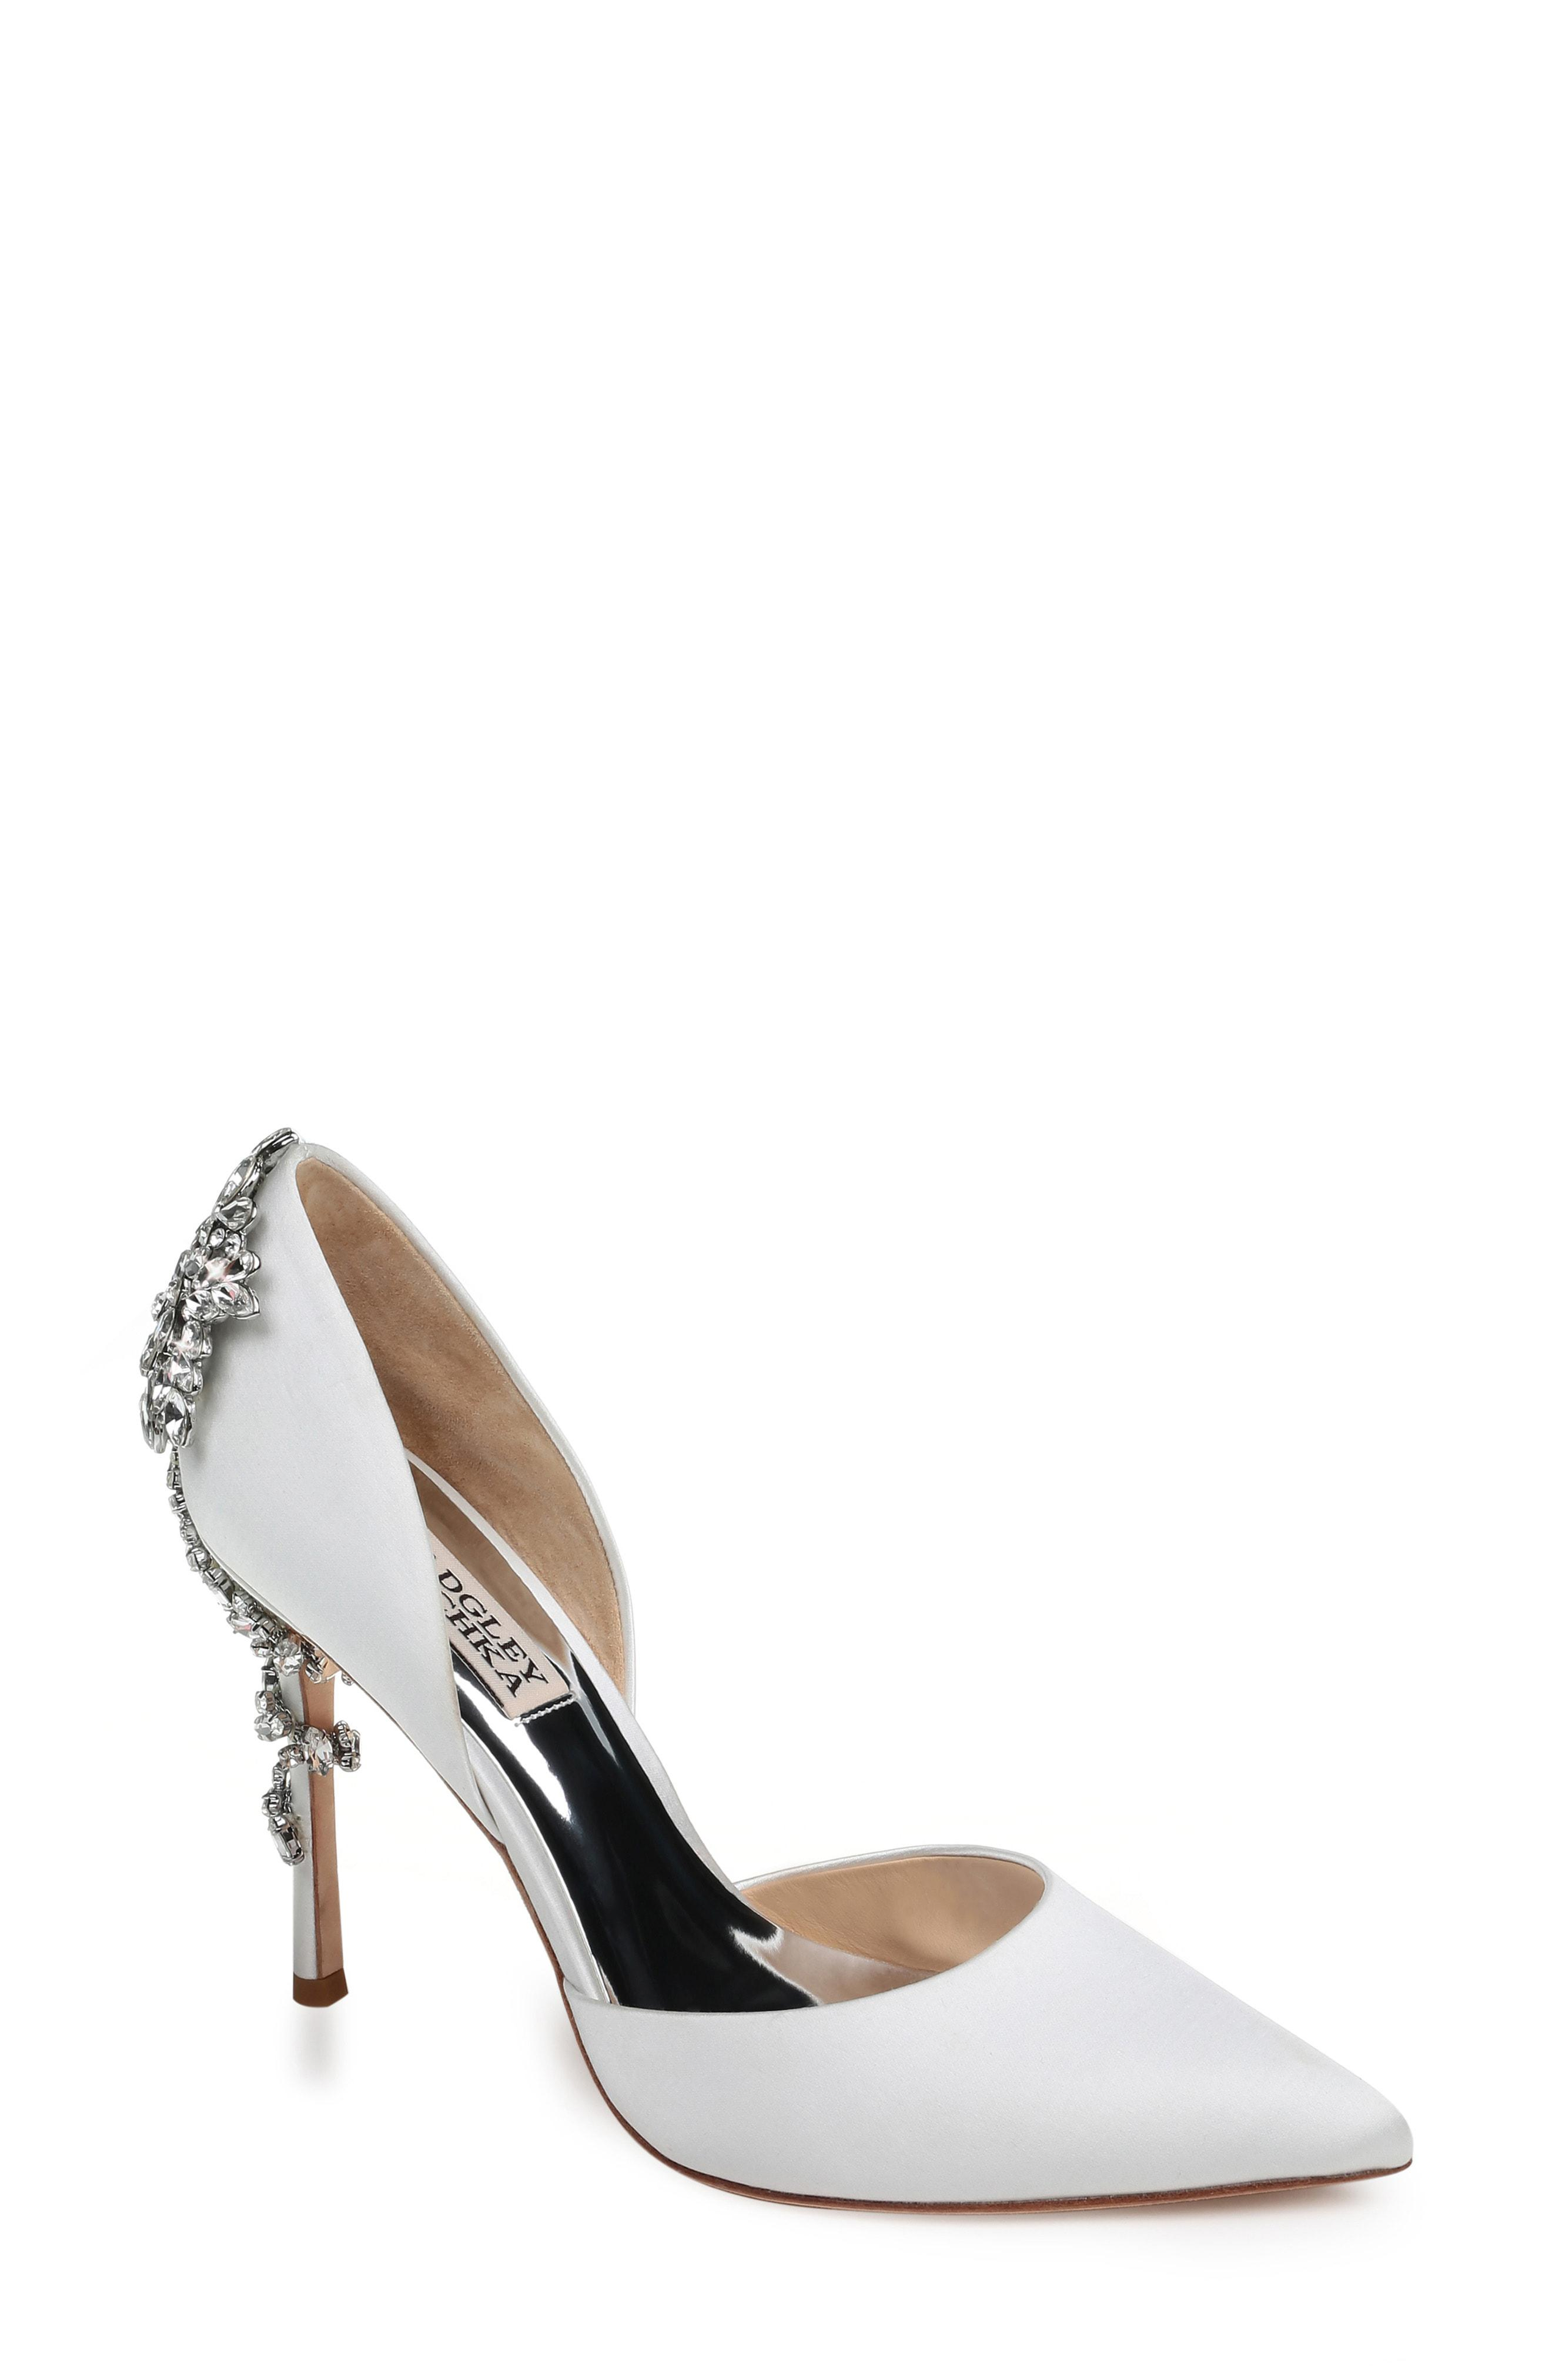 57d6c08ceb1f Lyst - Badgley Mischka Badgley Mischka Vogue Crystal Embellished D ...